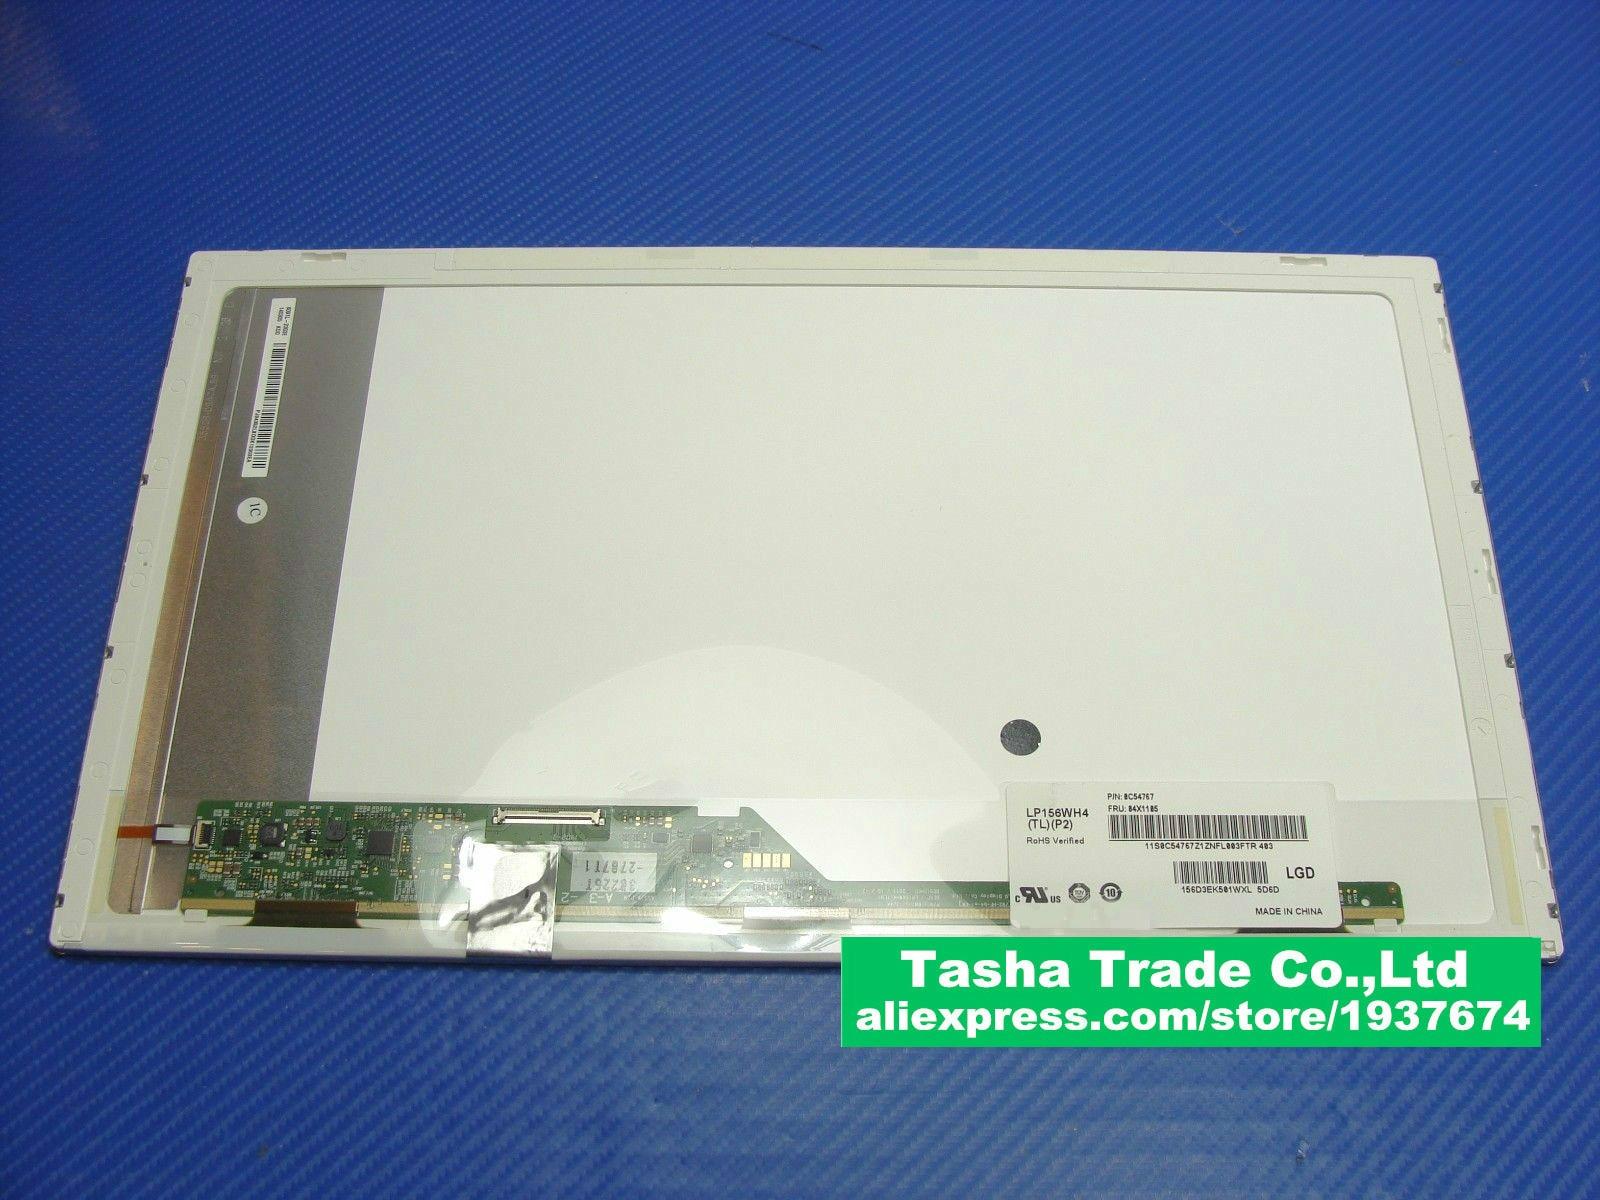 "LP156WH4 LP156WH4-TLP2 LP156WH4 (TL) (P2) Pantalla LCD LED matriz inferior izquierda mate 15,6 ""LED Normal 1366*768 HD"